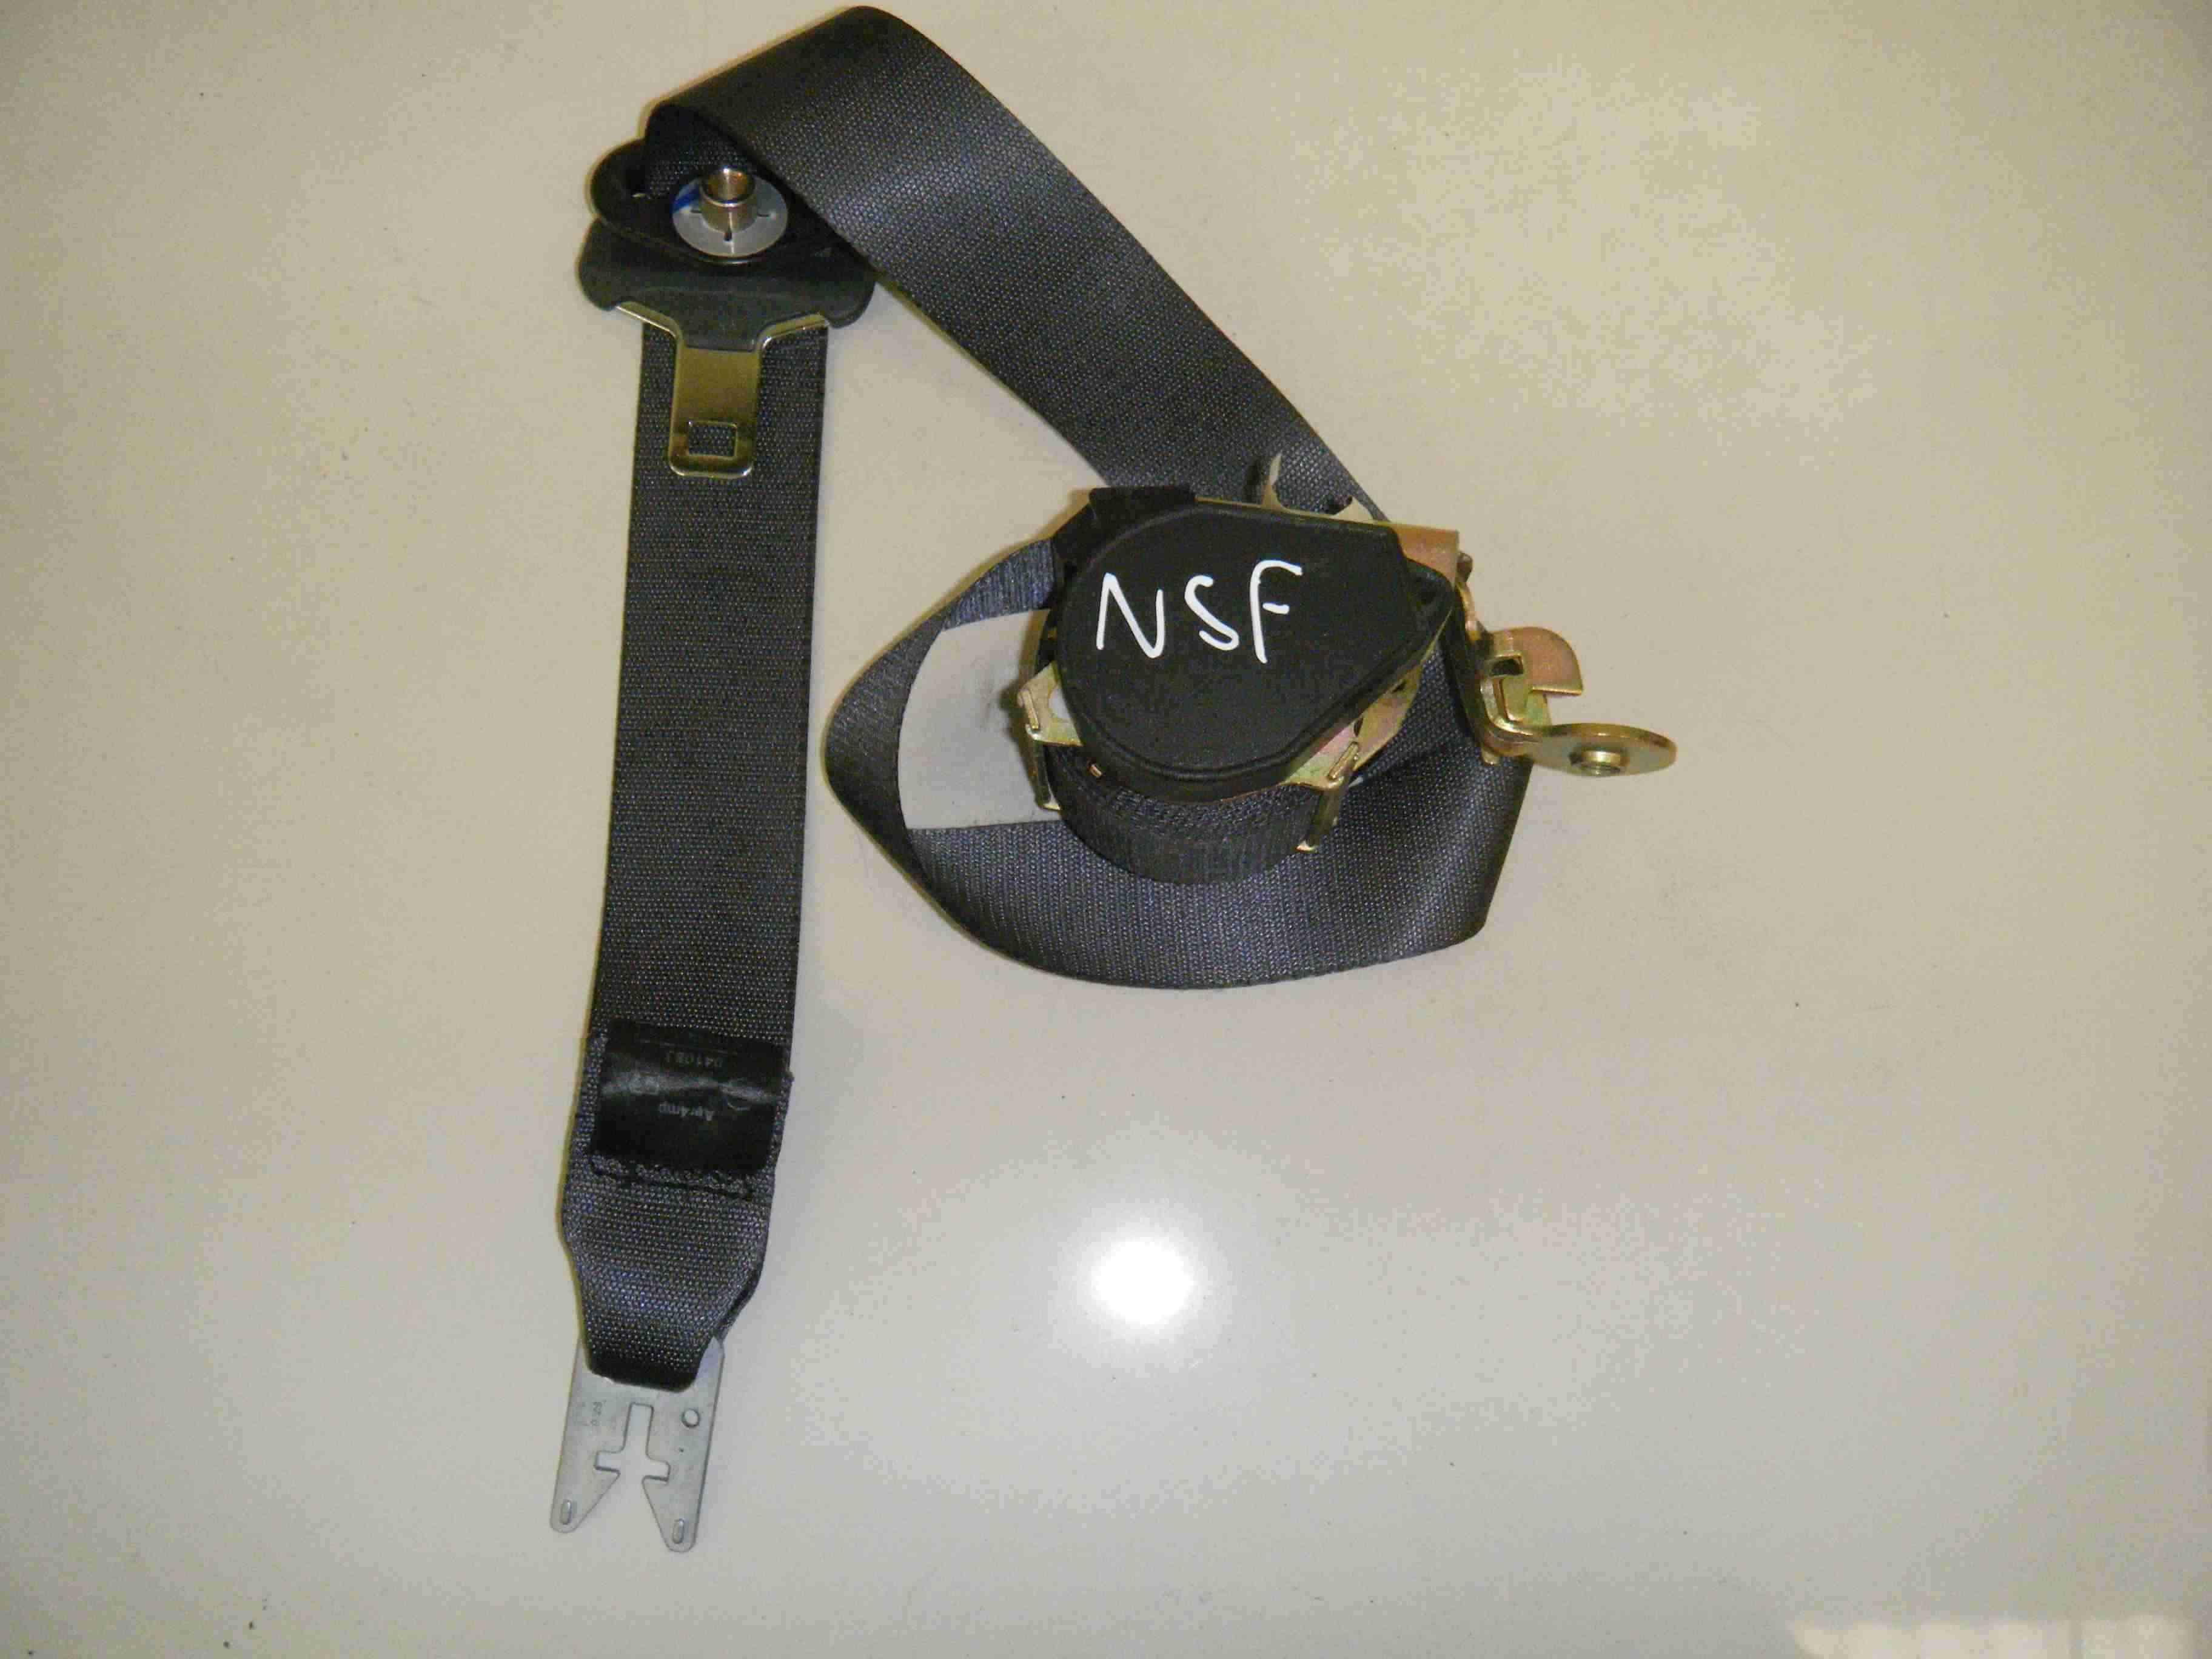 Renault Scenic 2003-2009 Passenger NSF Front Seat Belt 8200699576